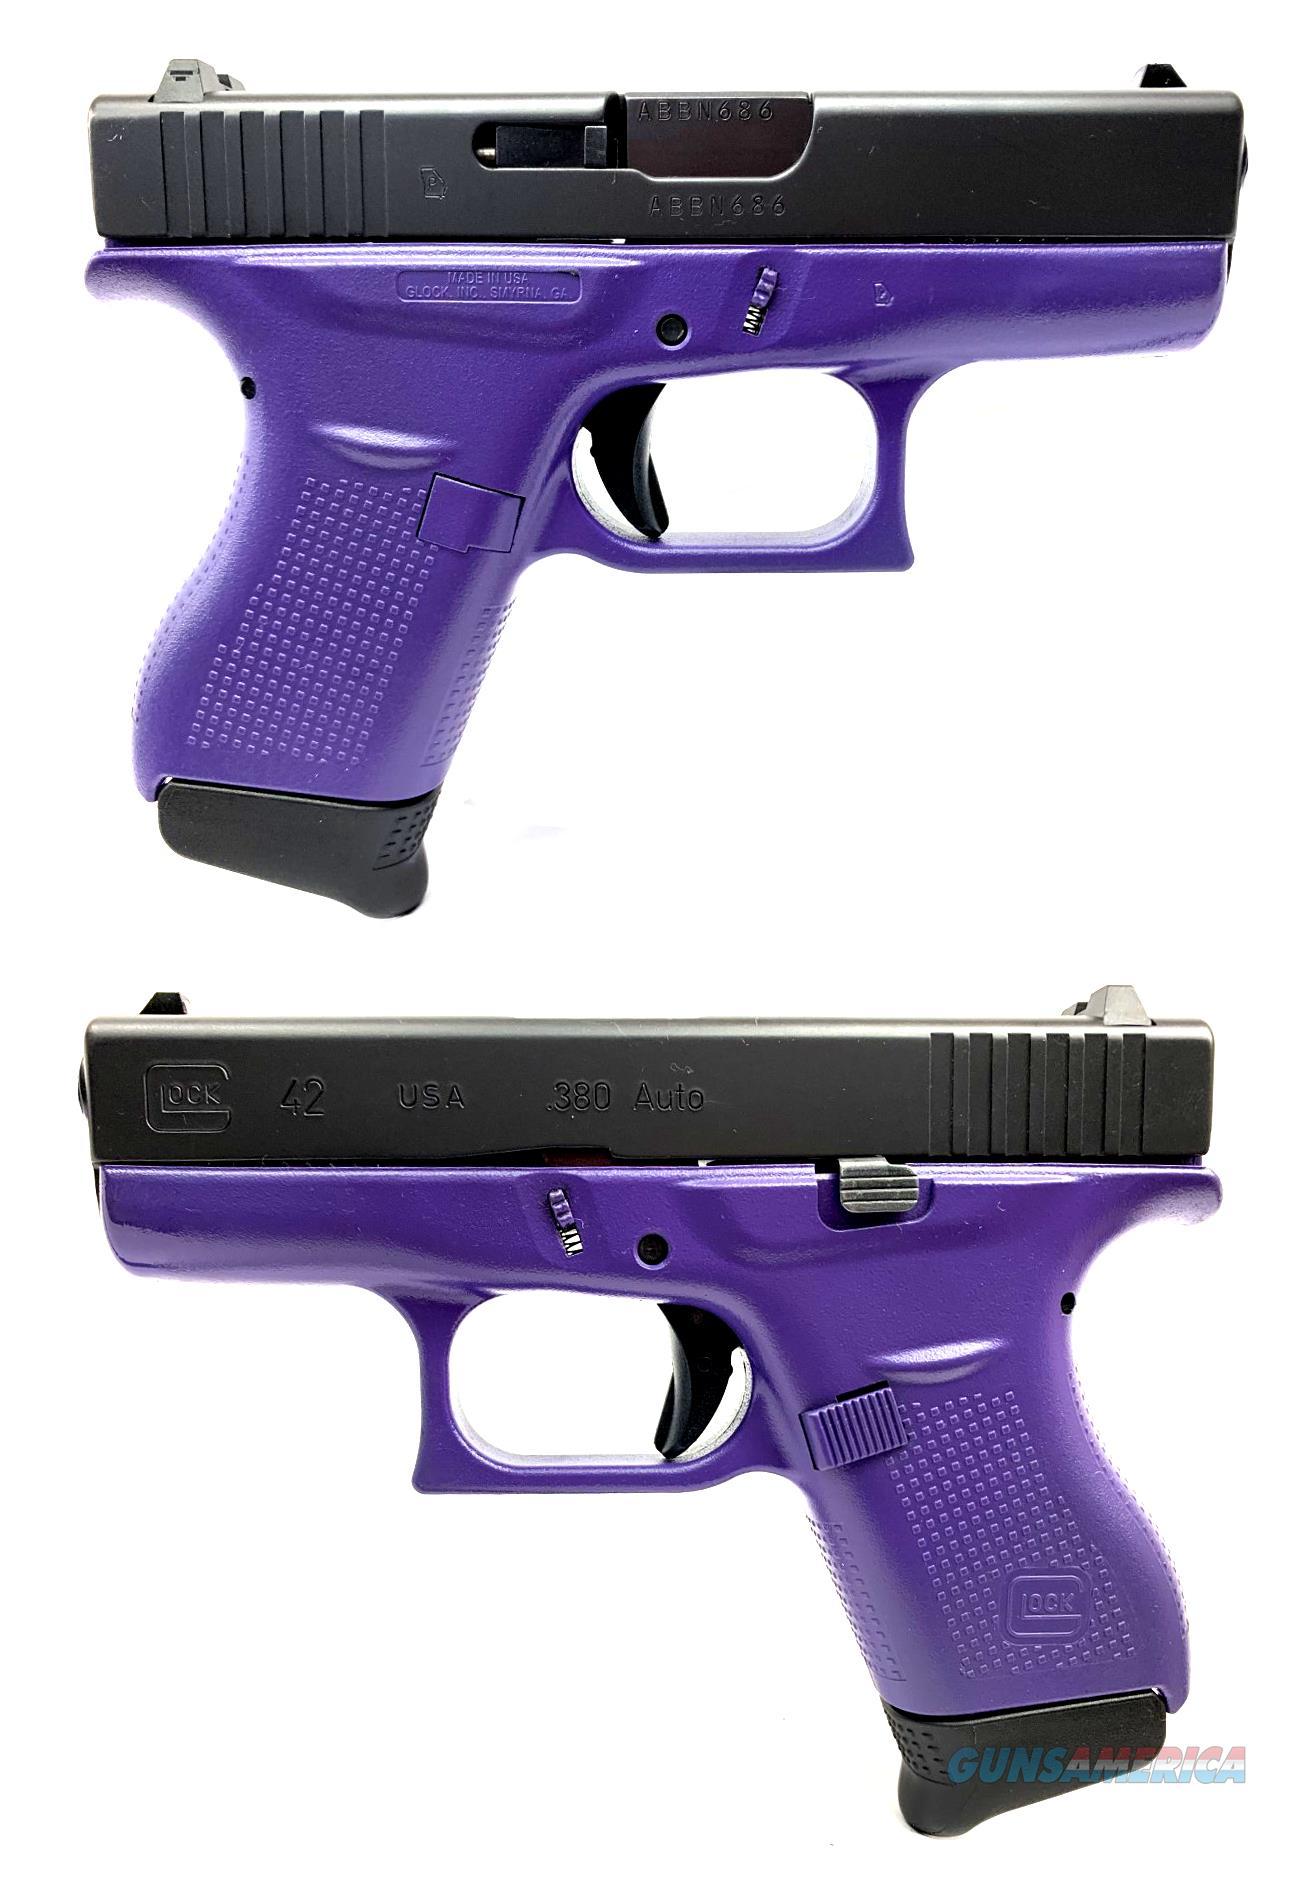 Glock 42 Purple Semi-Automatic Pistol  Guns > Pistols > Glock Pistols > 42